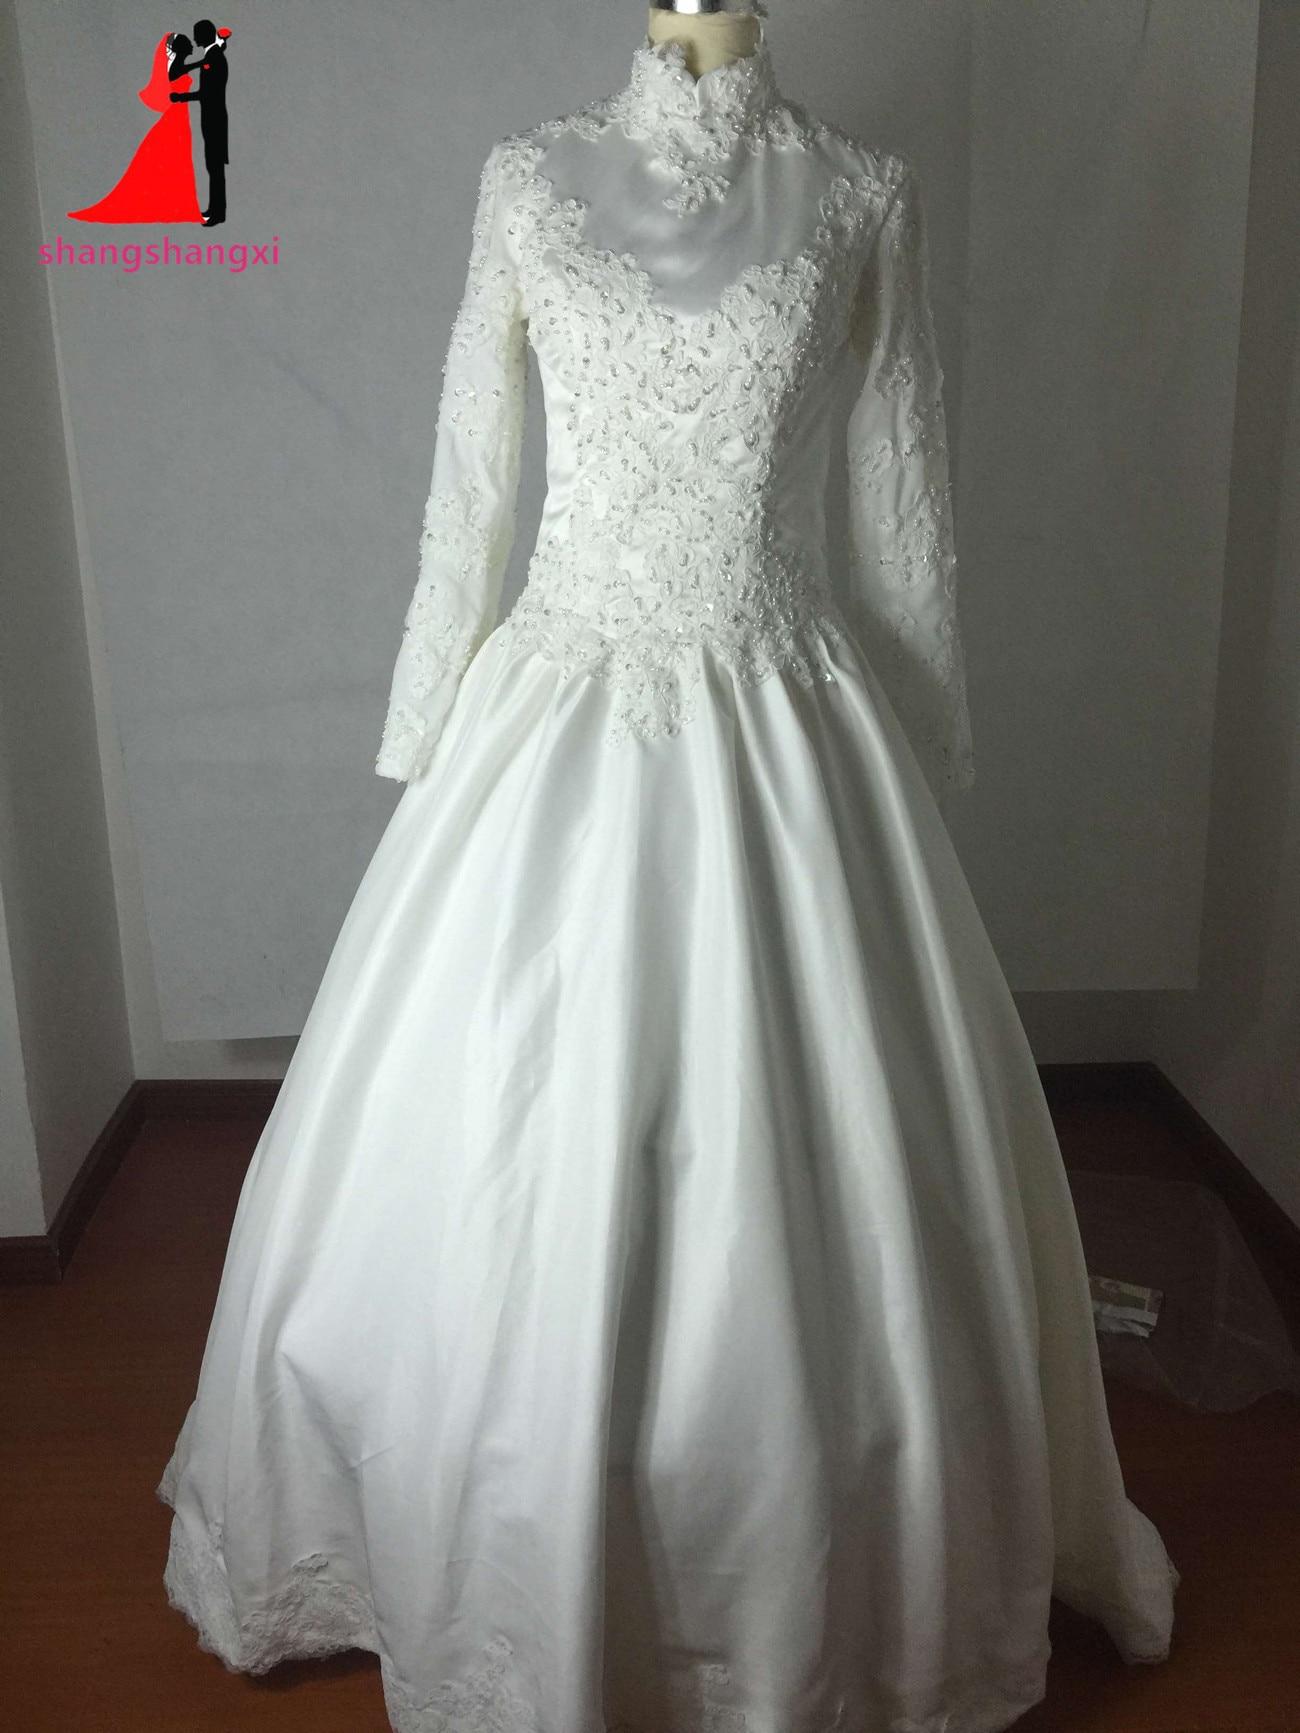 Quinceanera Muslim Dresses Reviews Line Shopping Fresh Wedding Online China